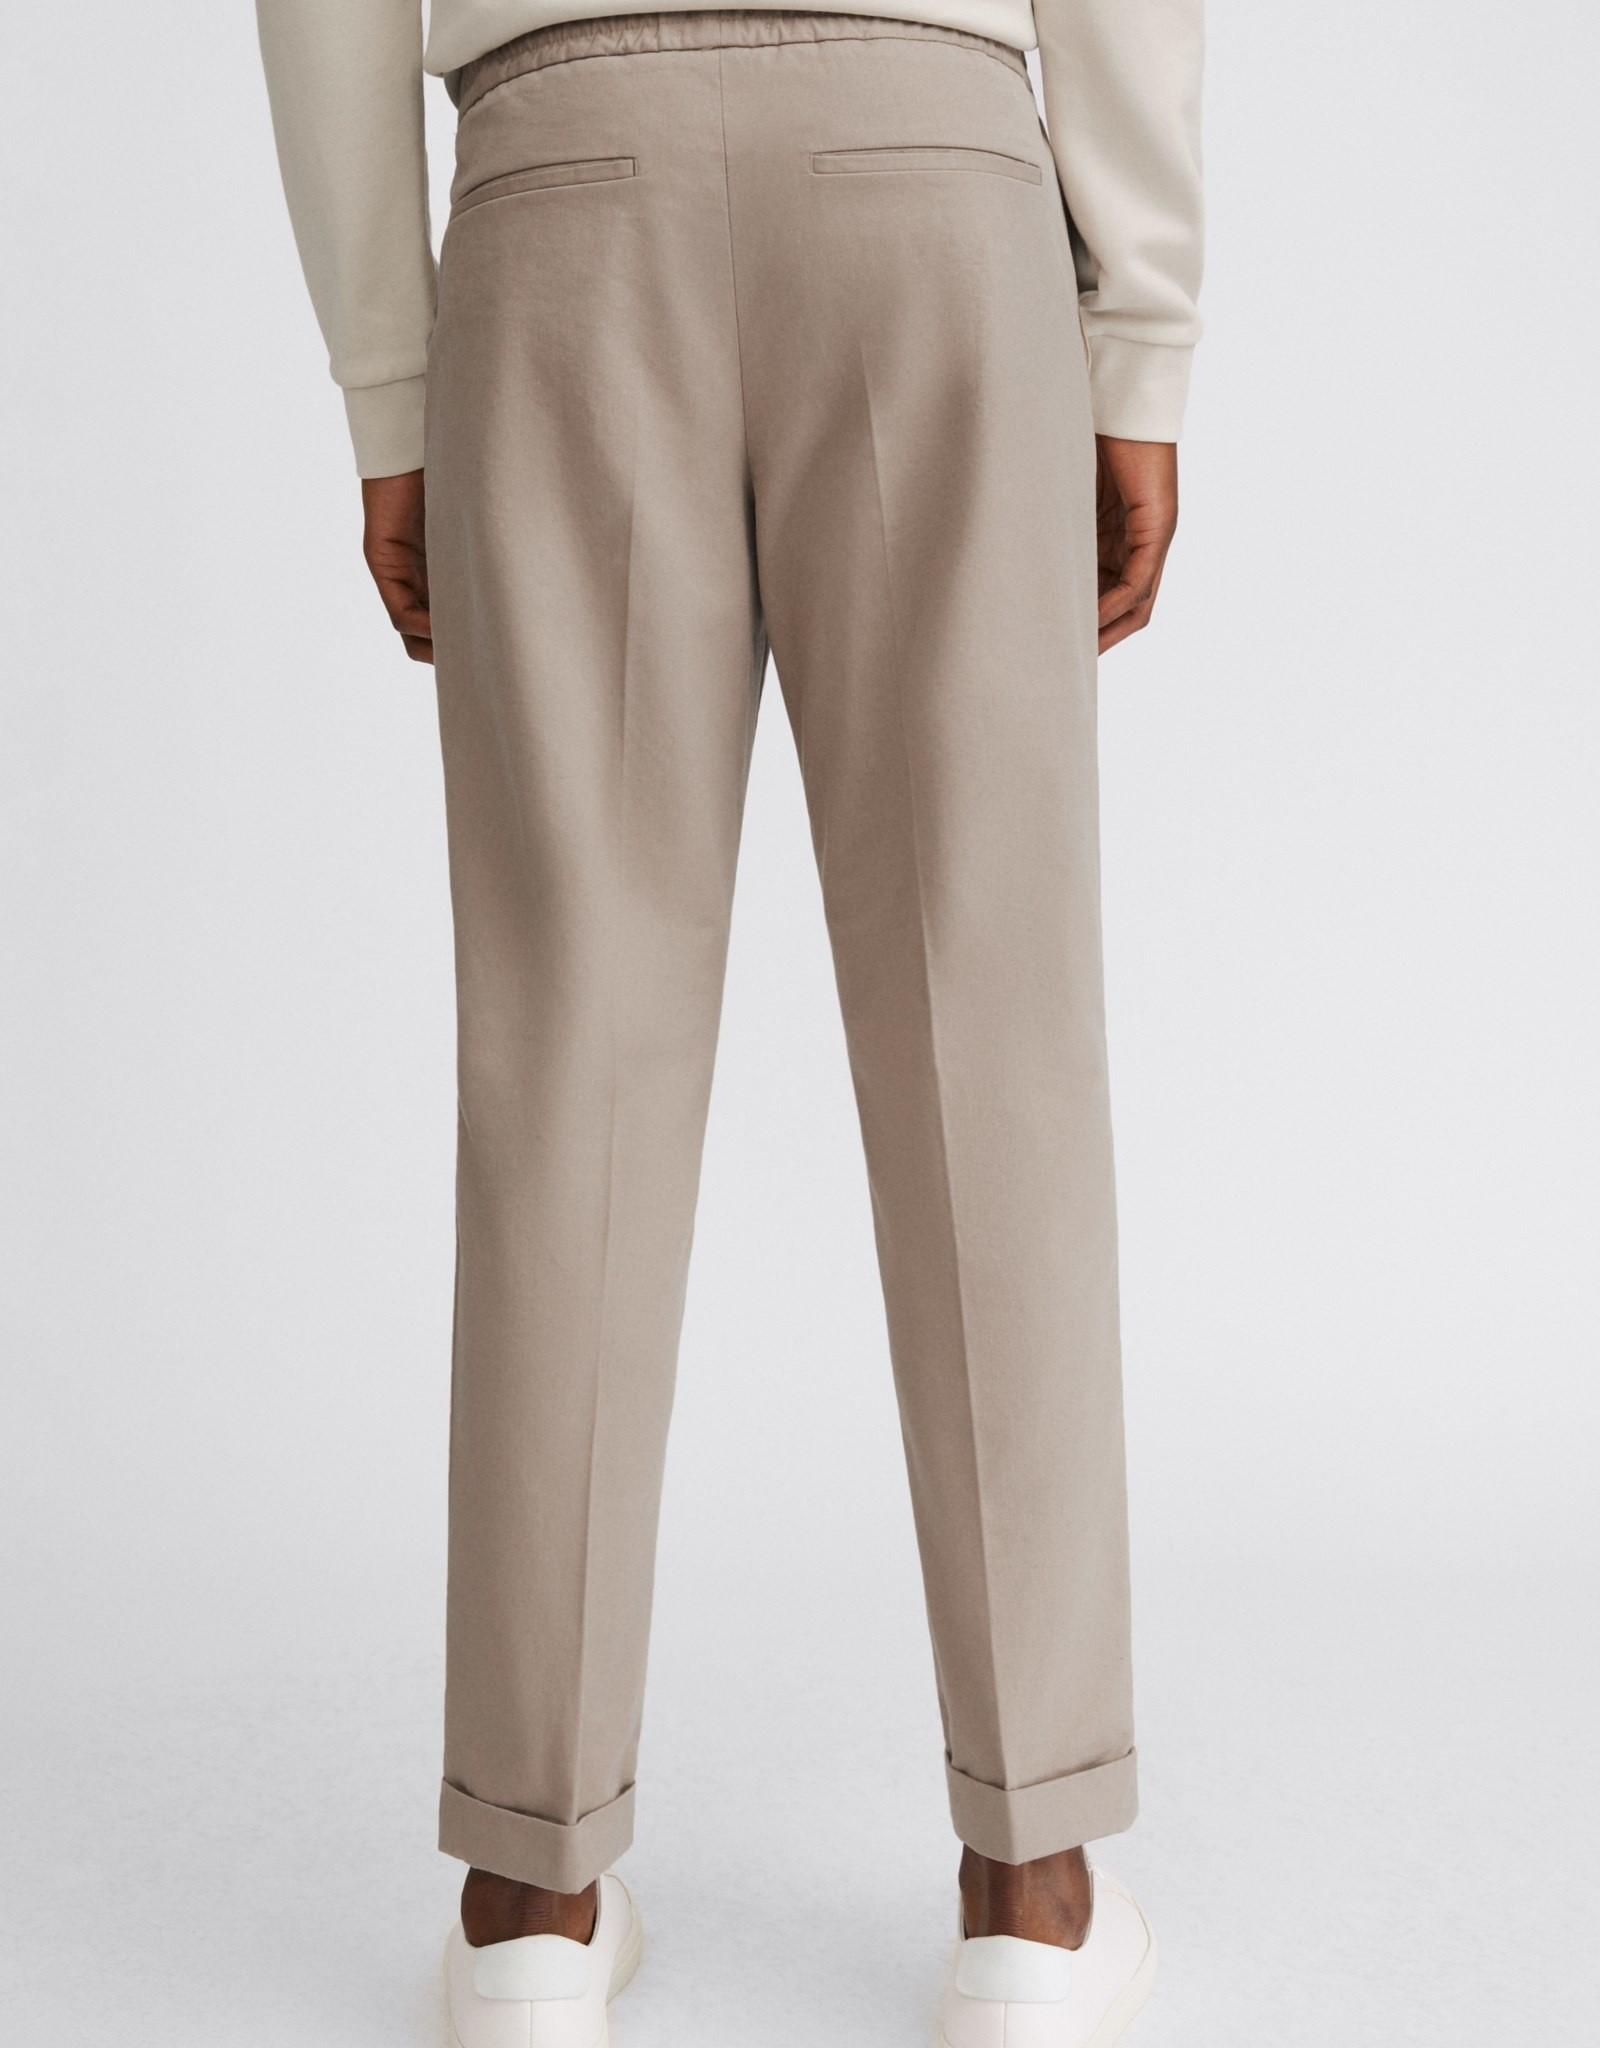 Filippa K M. Terry Cotton Trouser Desert Taupe